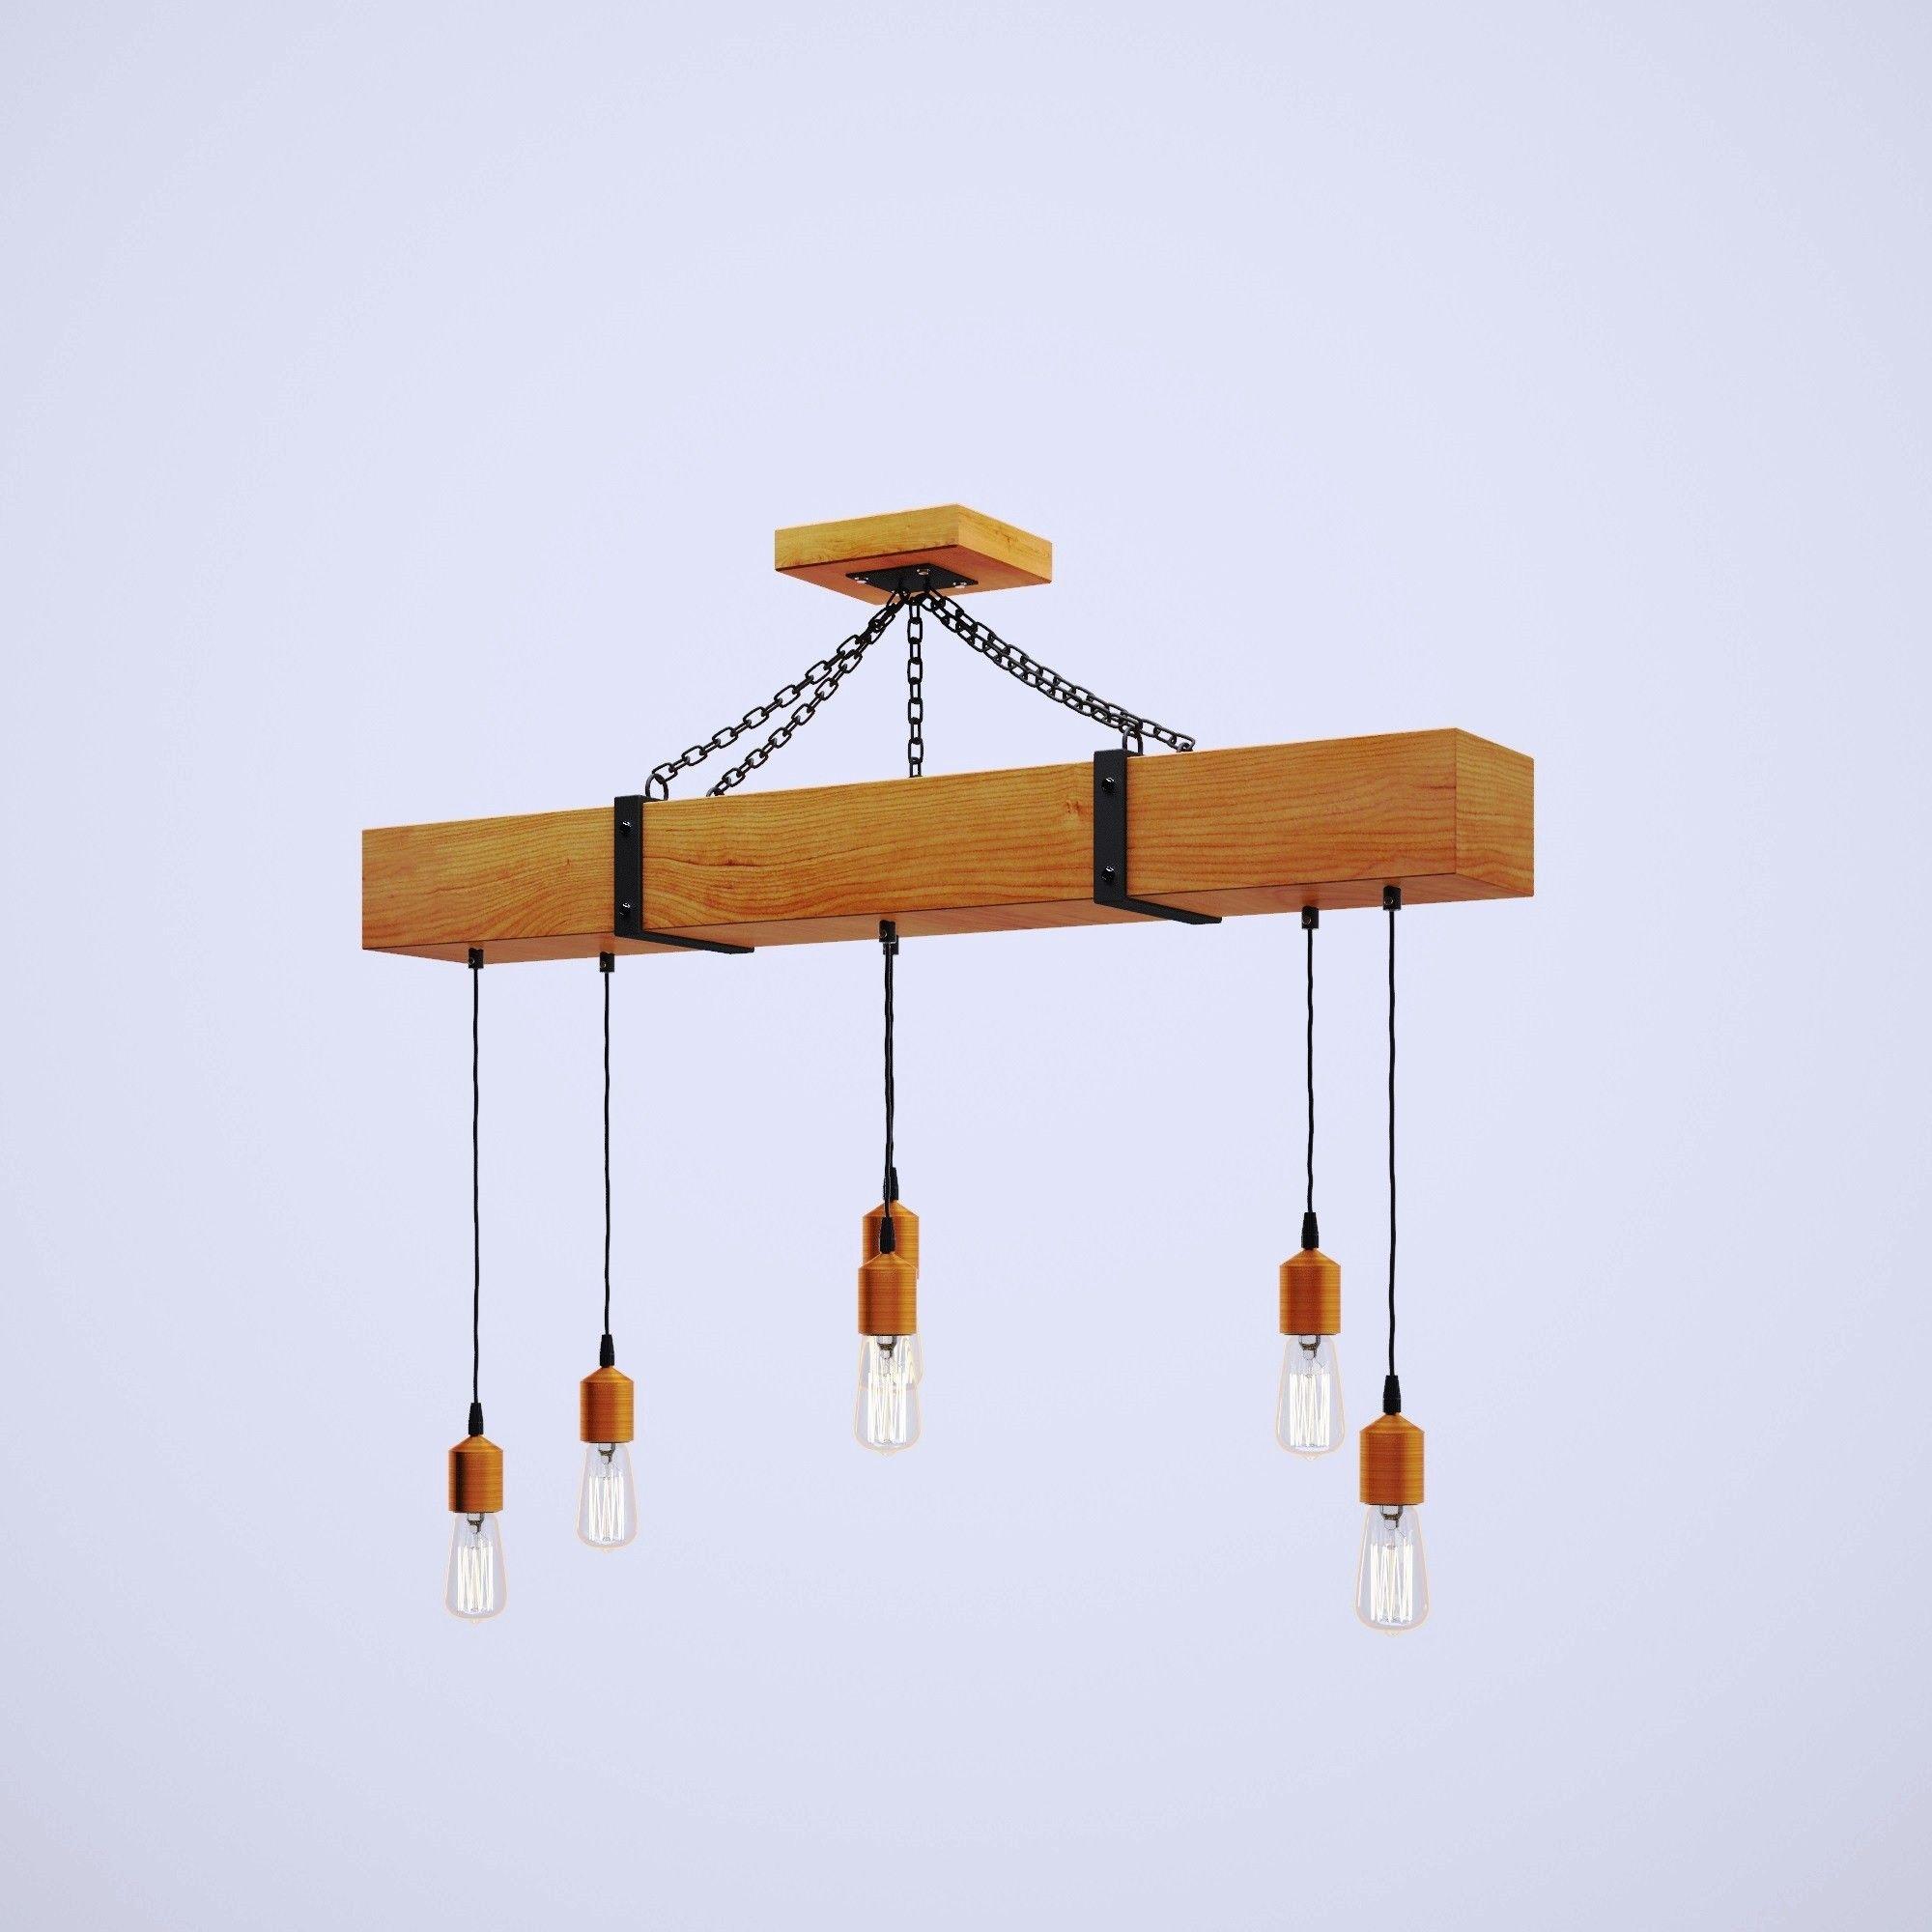 Dining table light fixture 3ds max model cadblocksfree dining table lighting